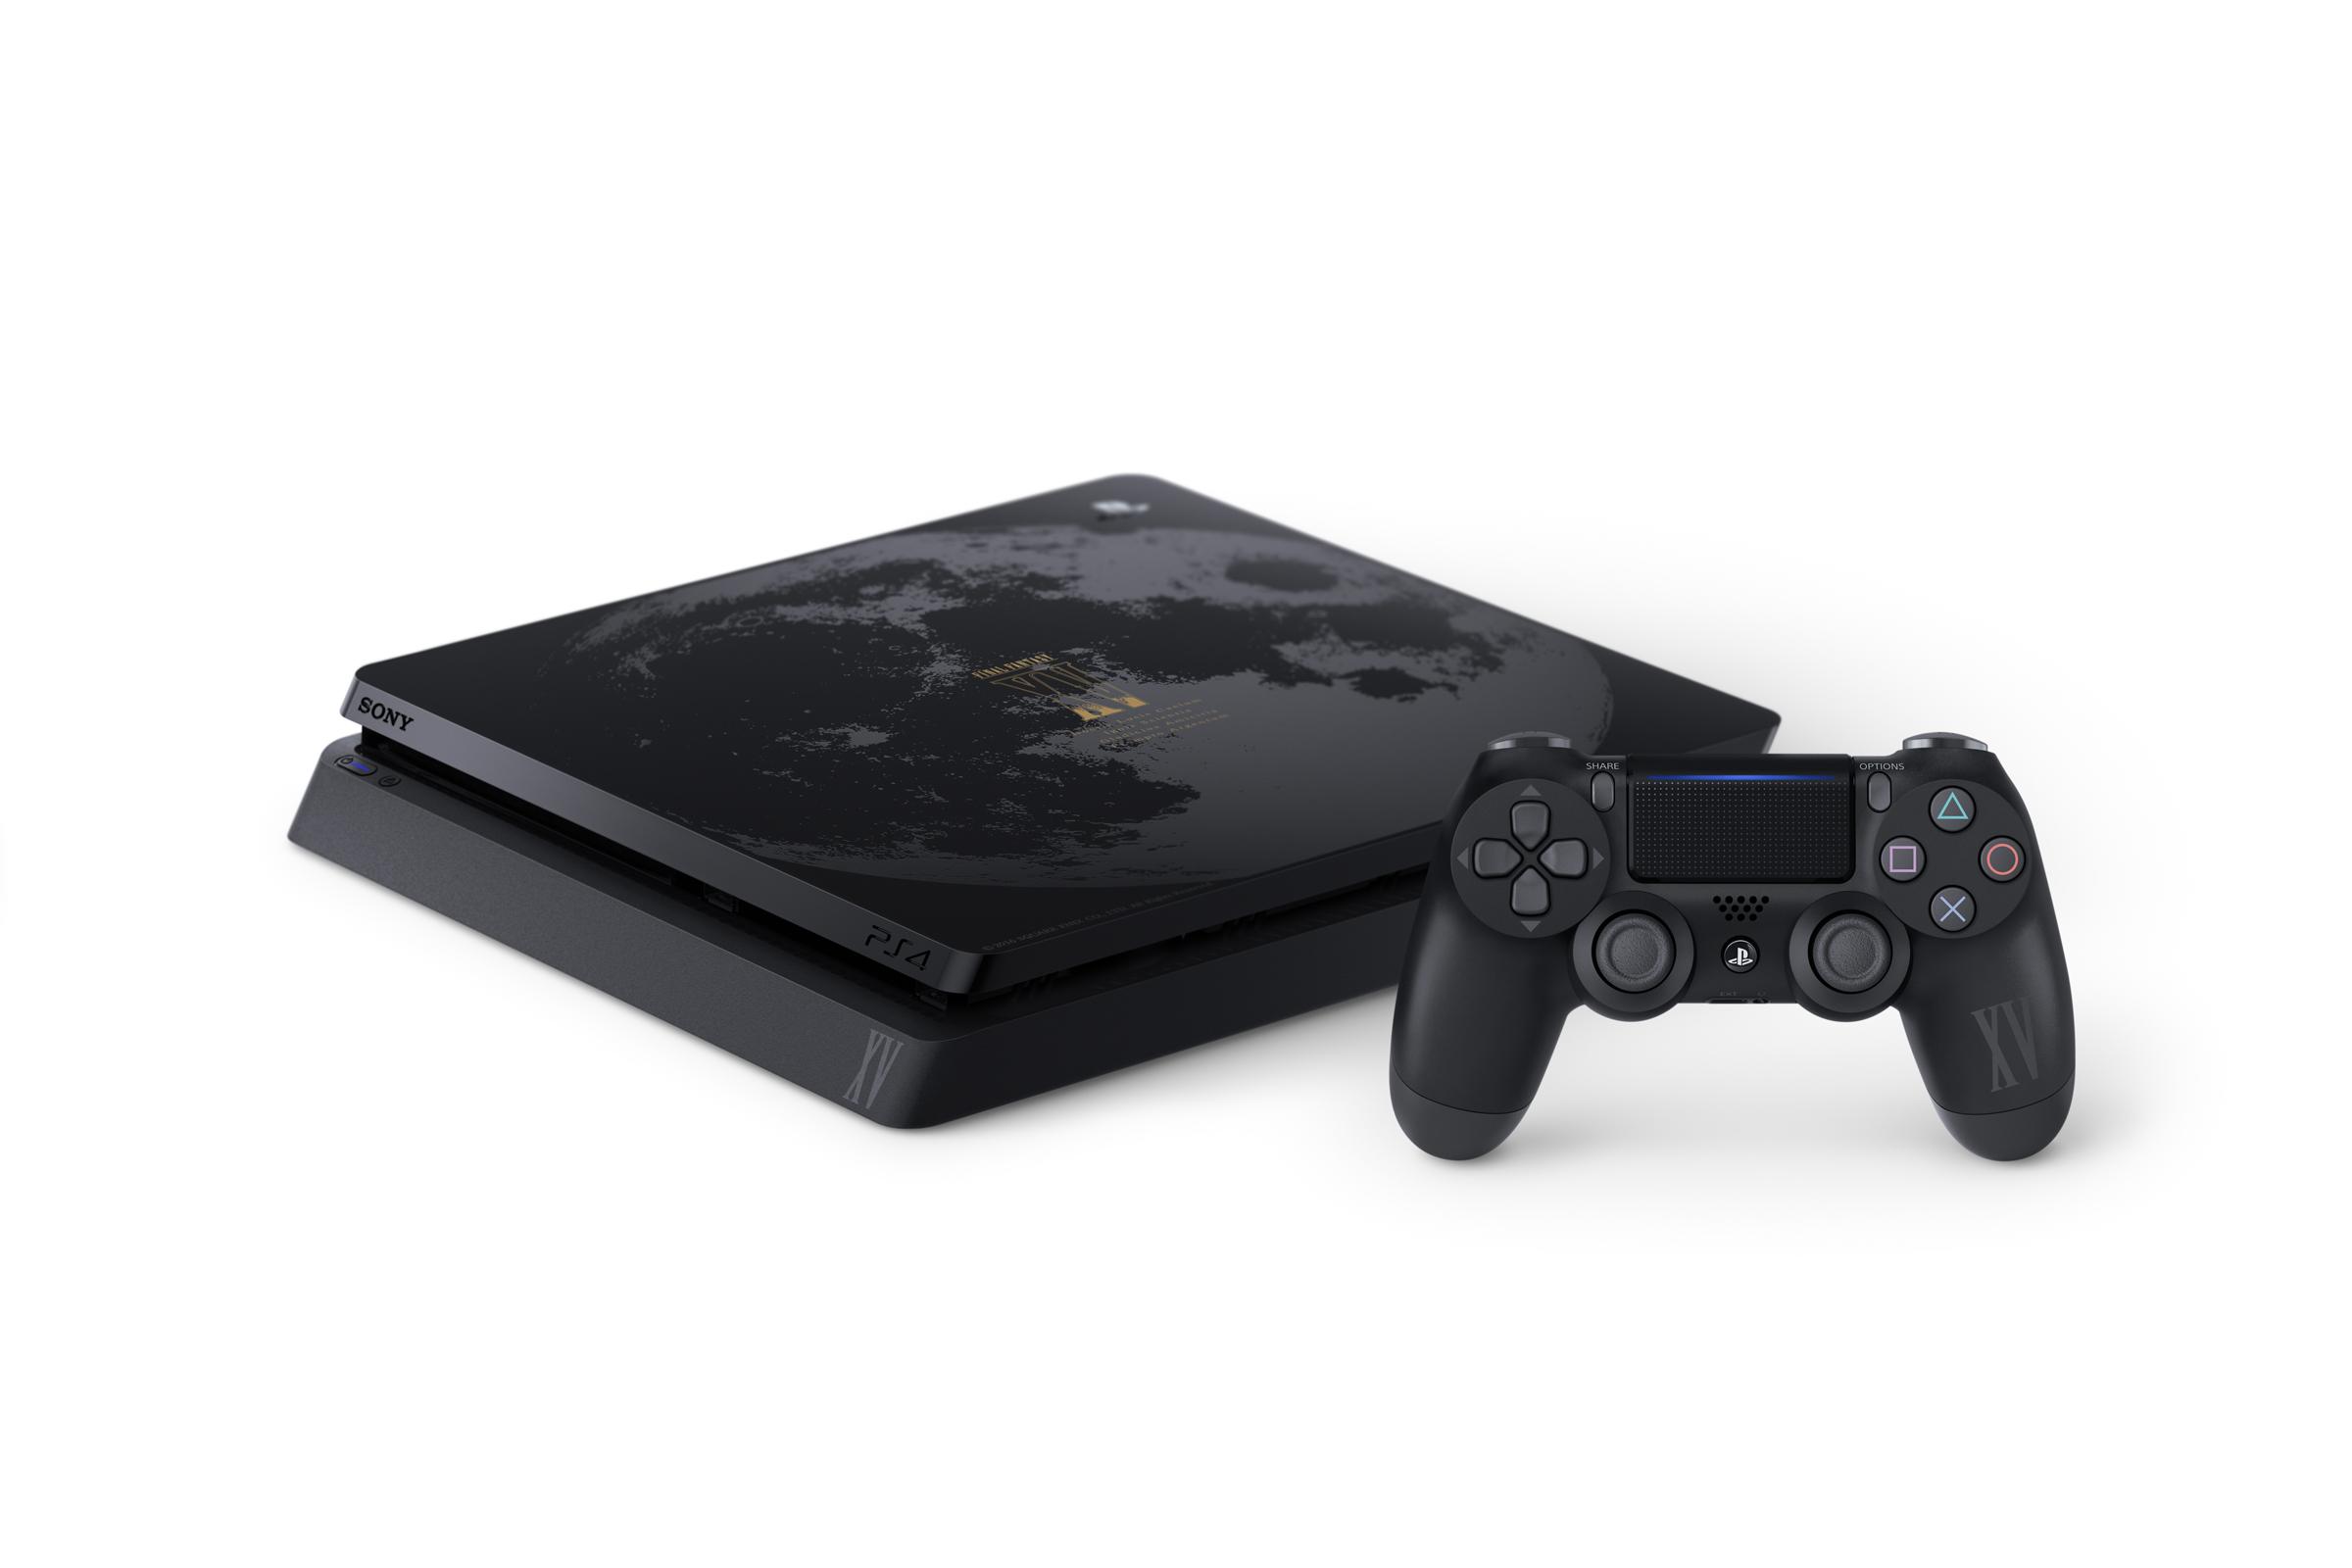 FF XV Luna PS4 Slim